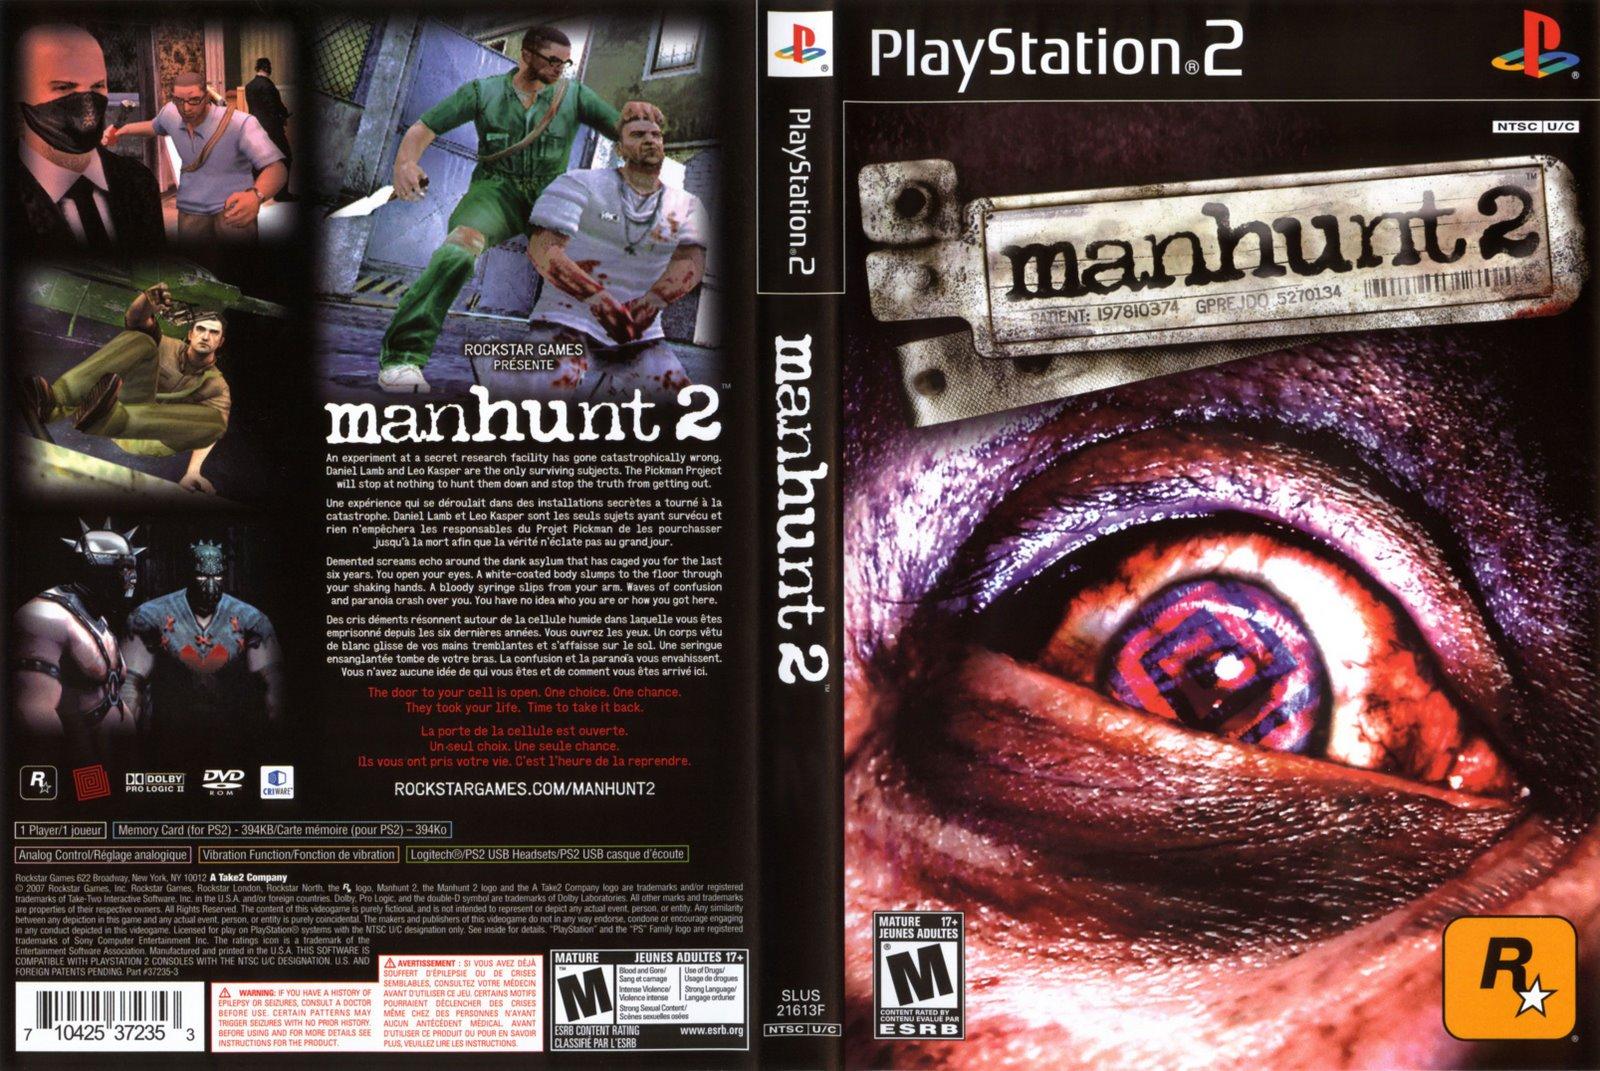 Manhunt 2 (USA) ROM / ISO Download for PlayStation 2 (PS2) - Rom Hustler